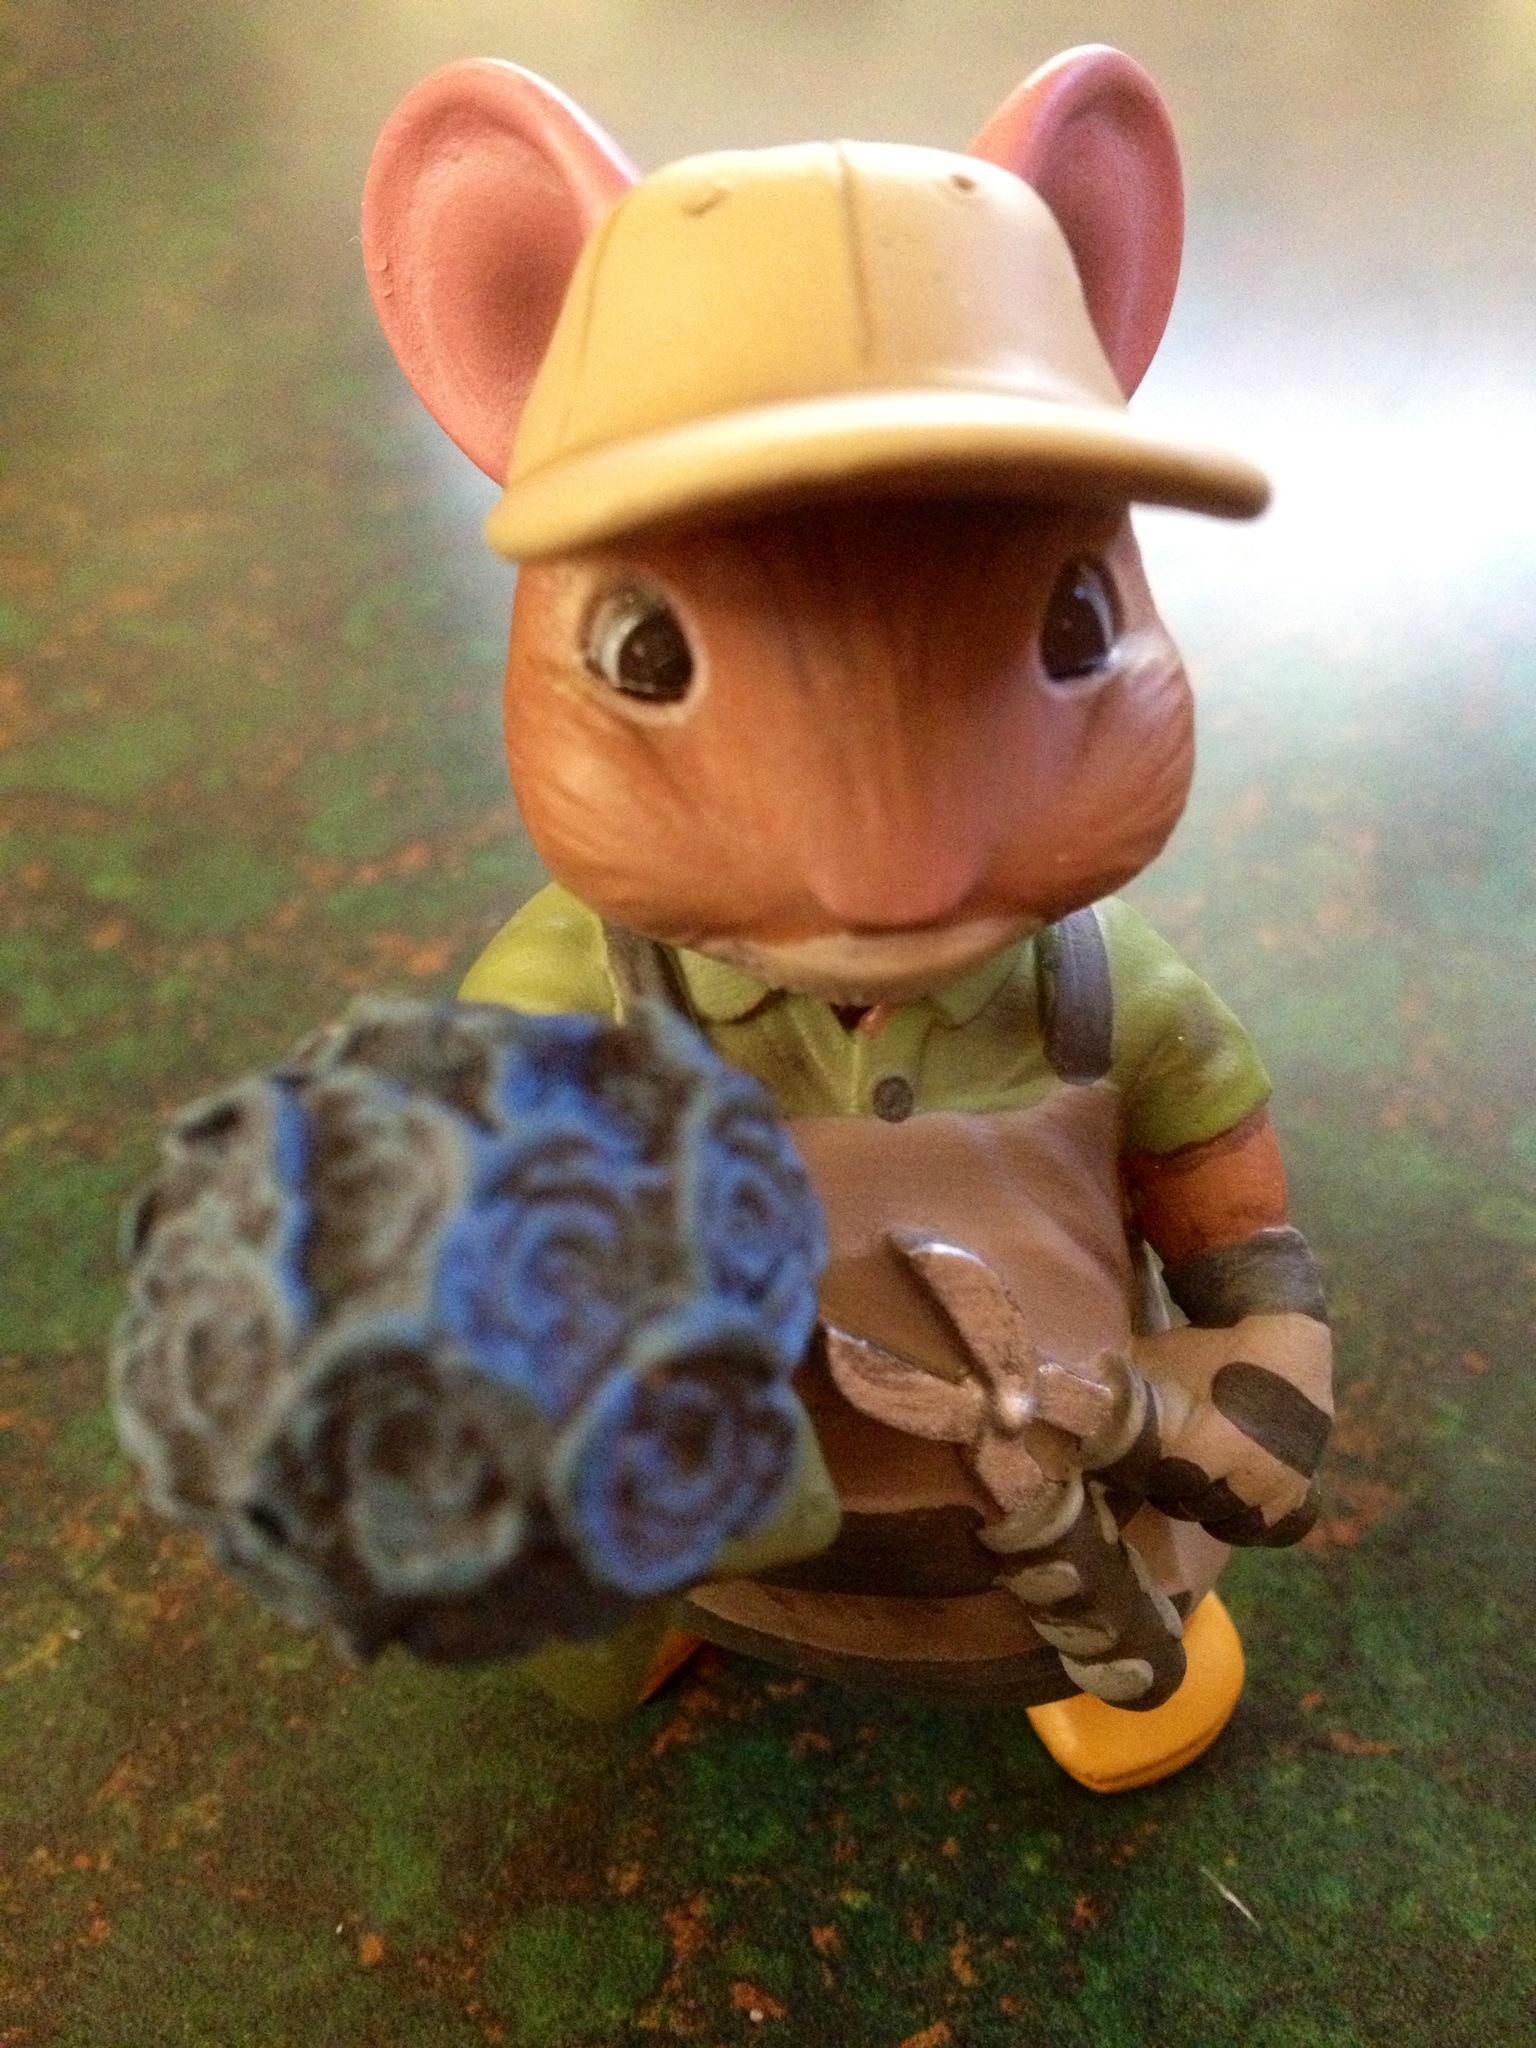 George the Gardener Figurine